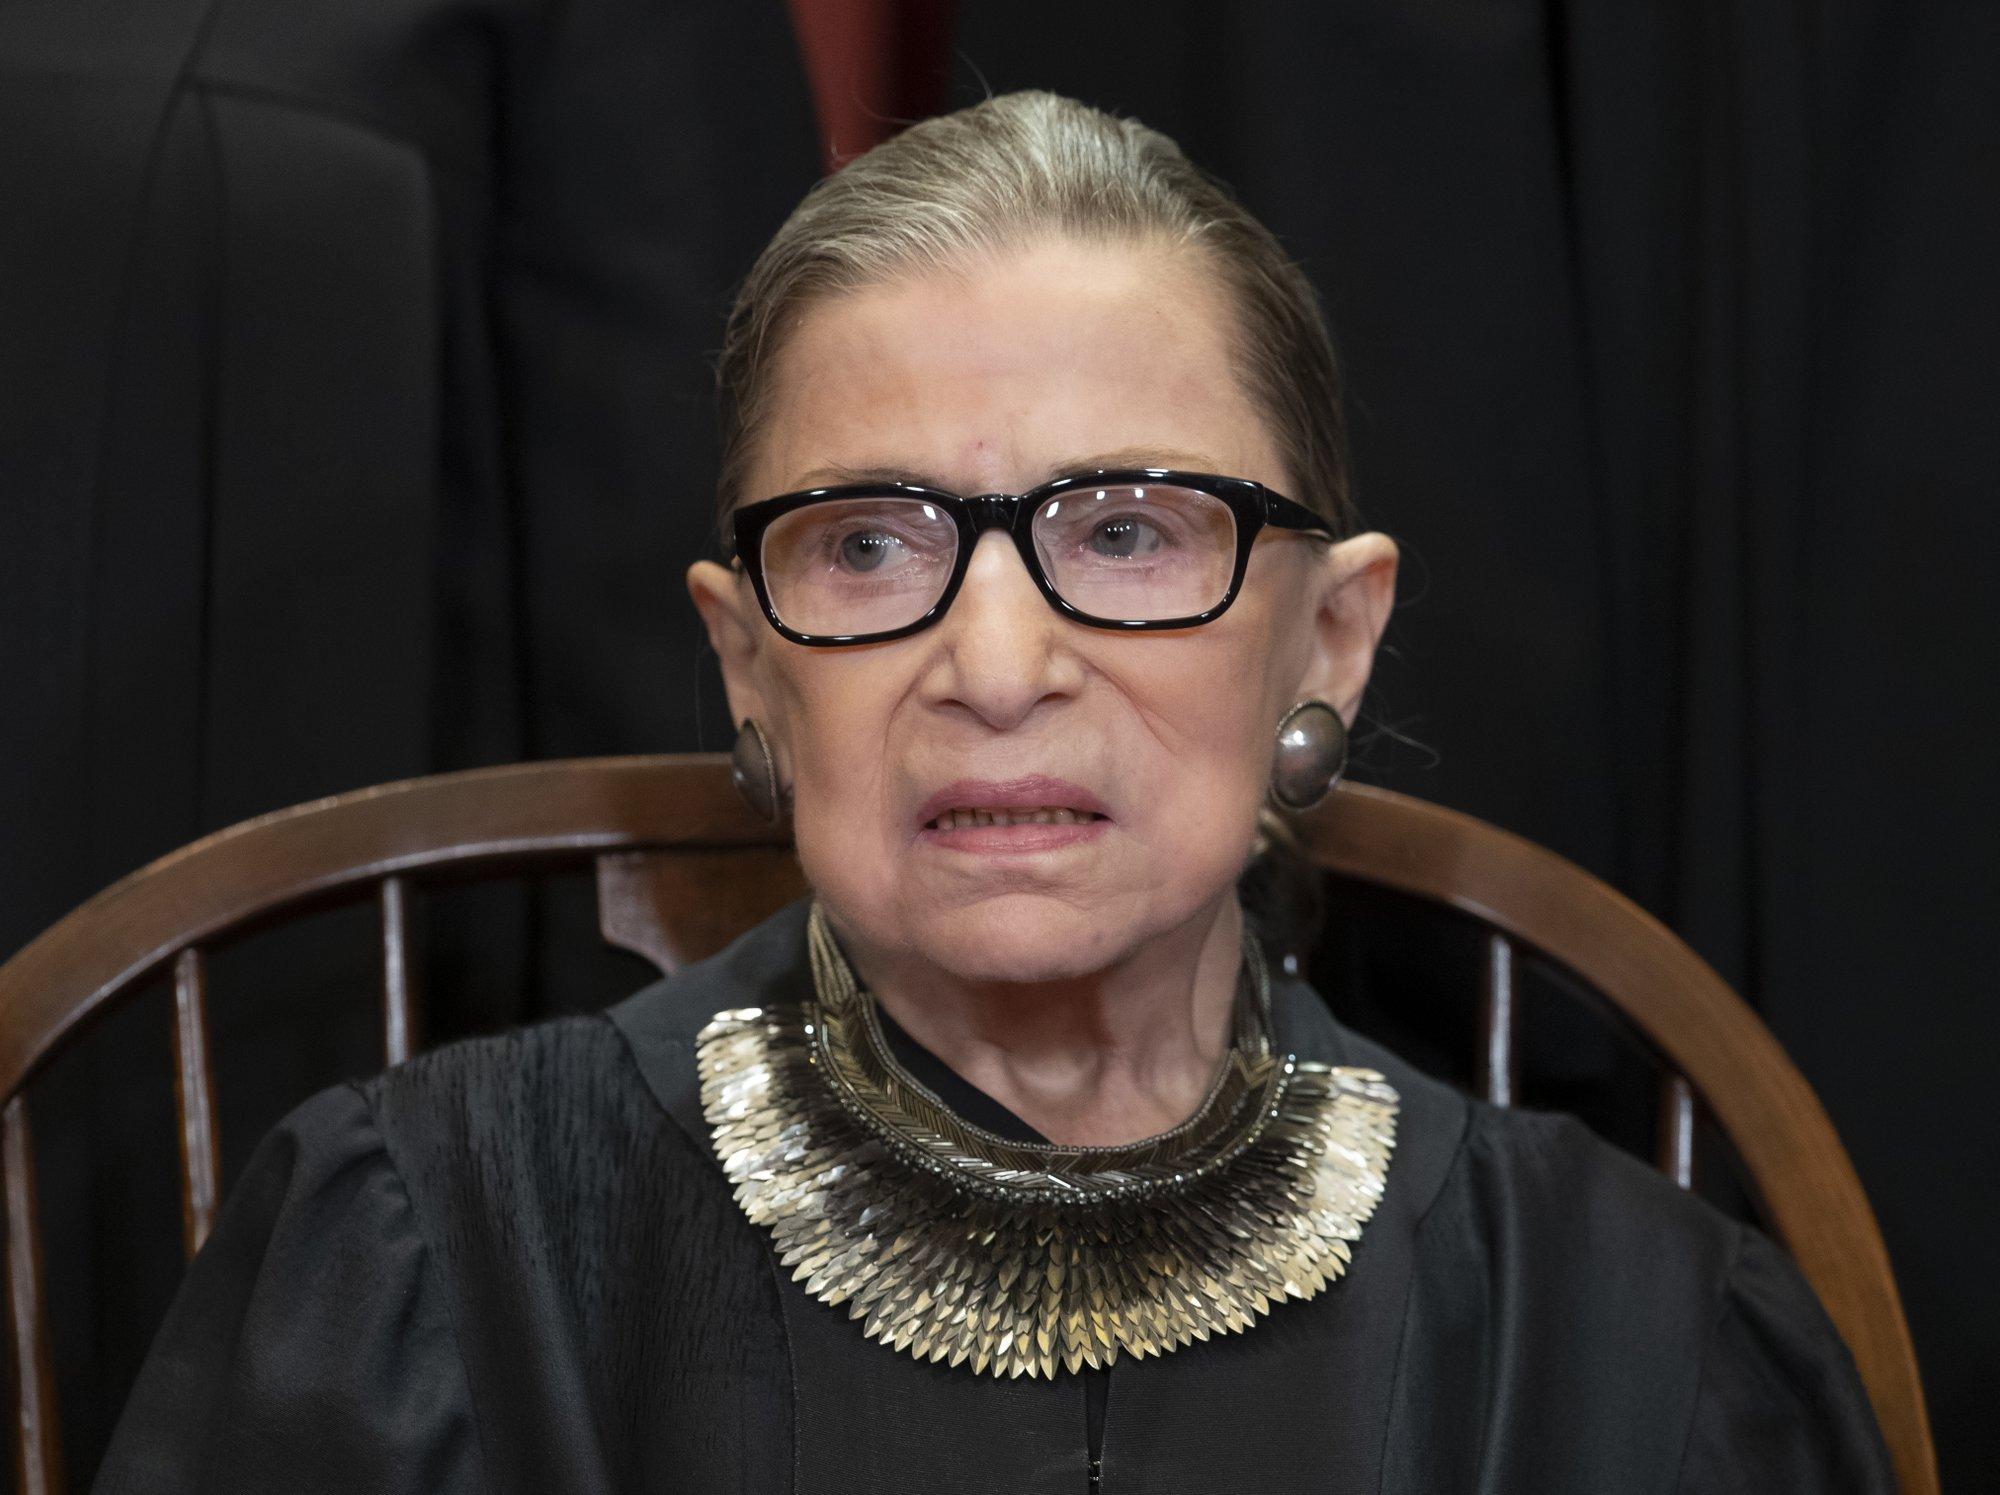 US Supreme Court justice Ginsburg leaves hospital